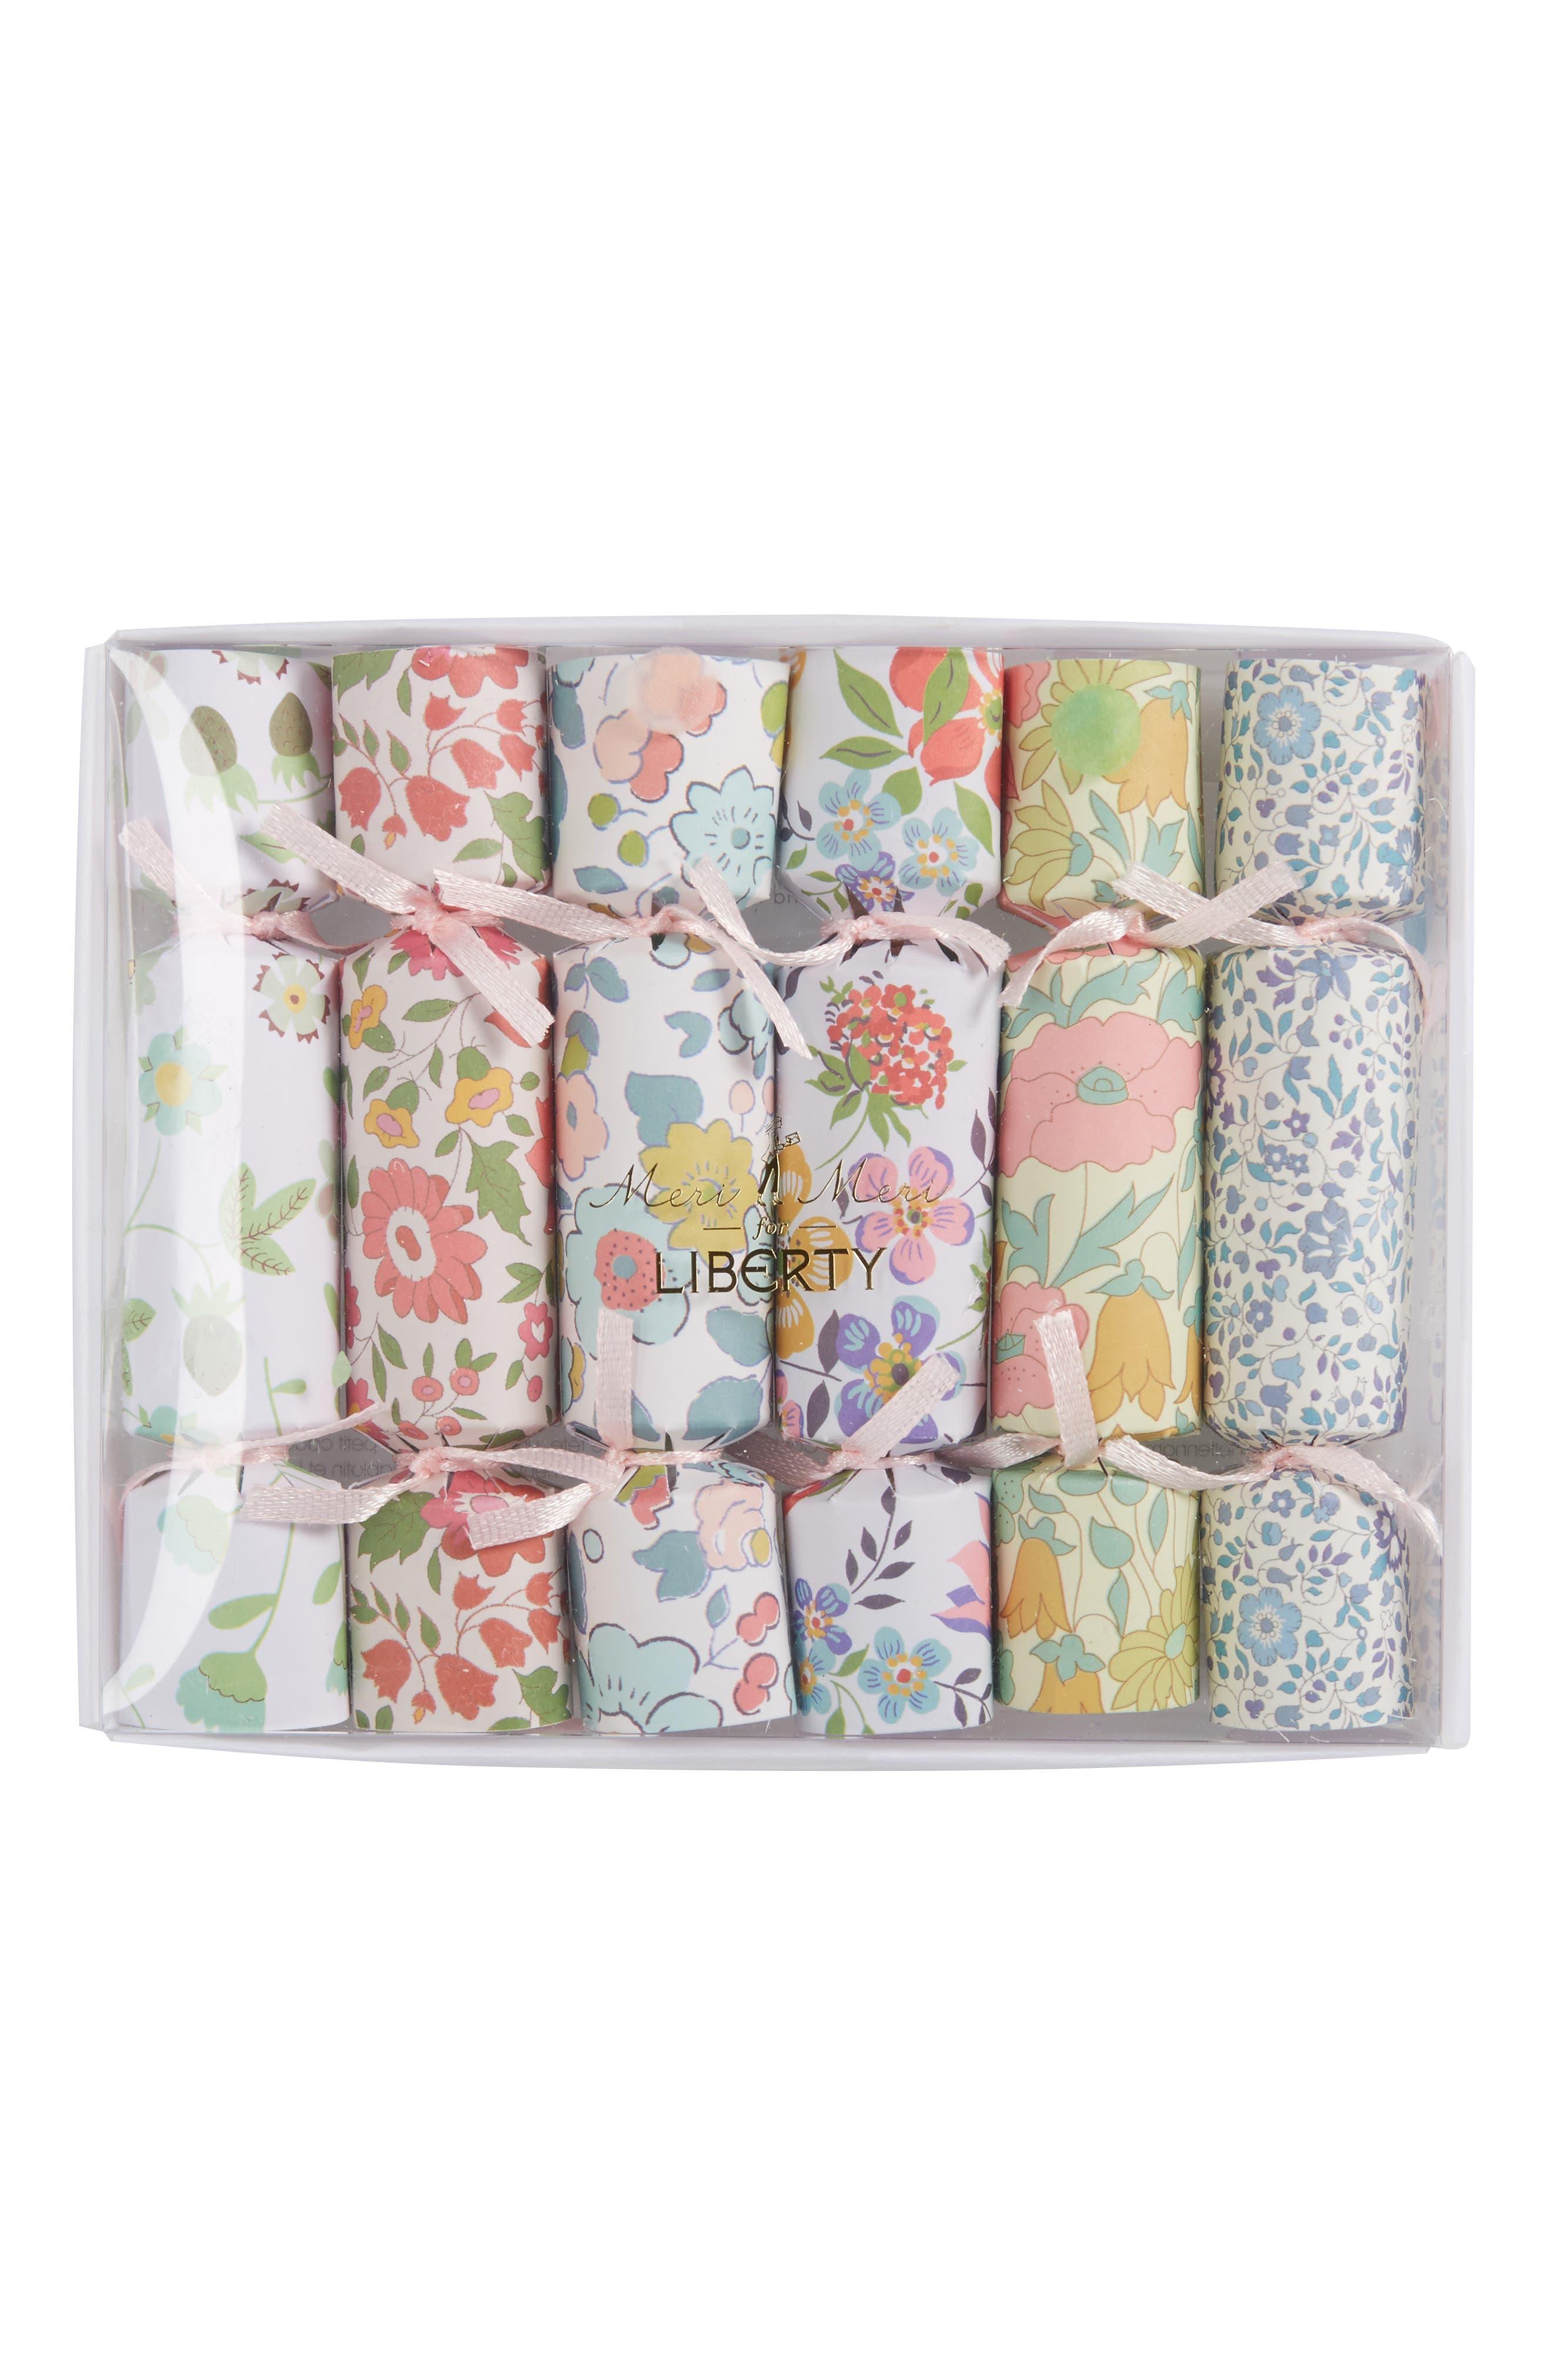 Meri Meri x Liberty 6-Pack Mini Foil Confetti Crackers